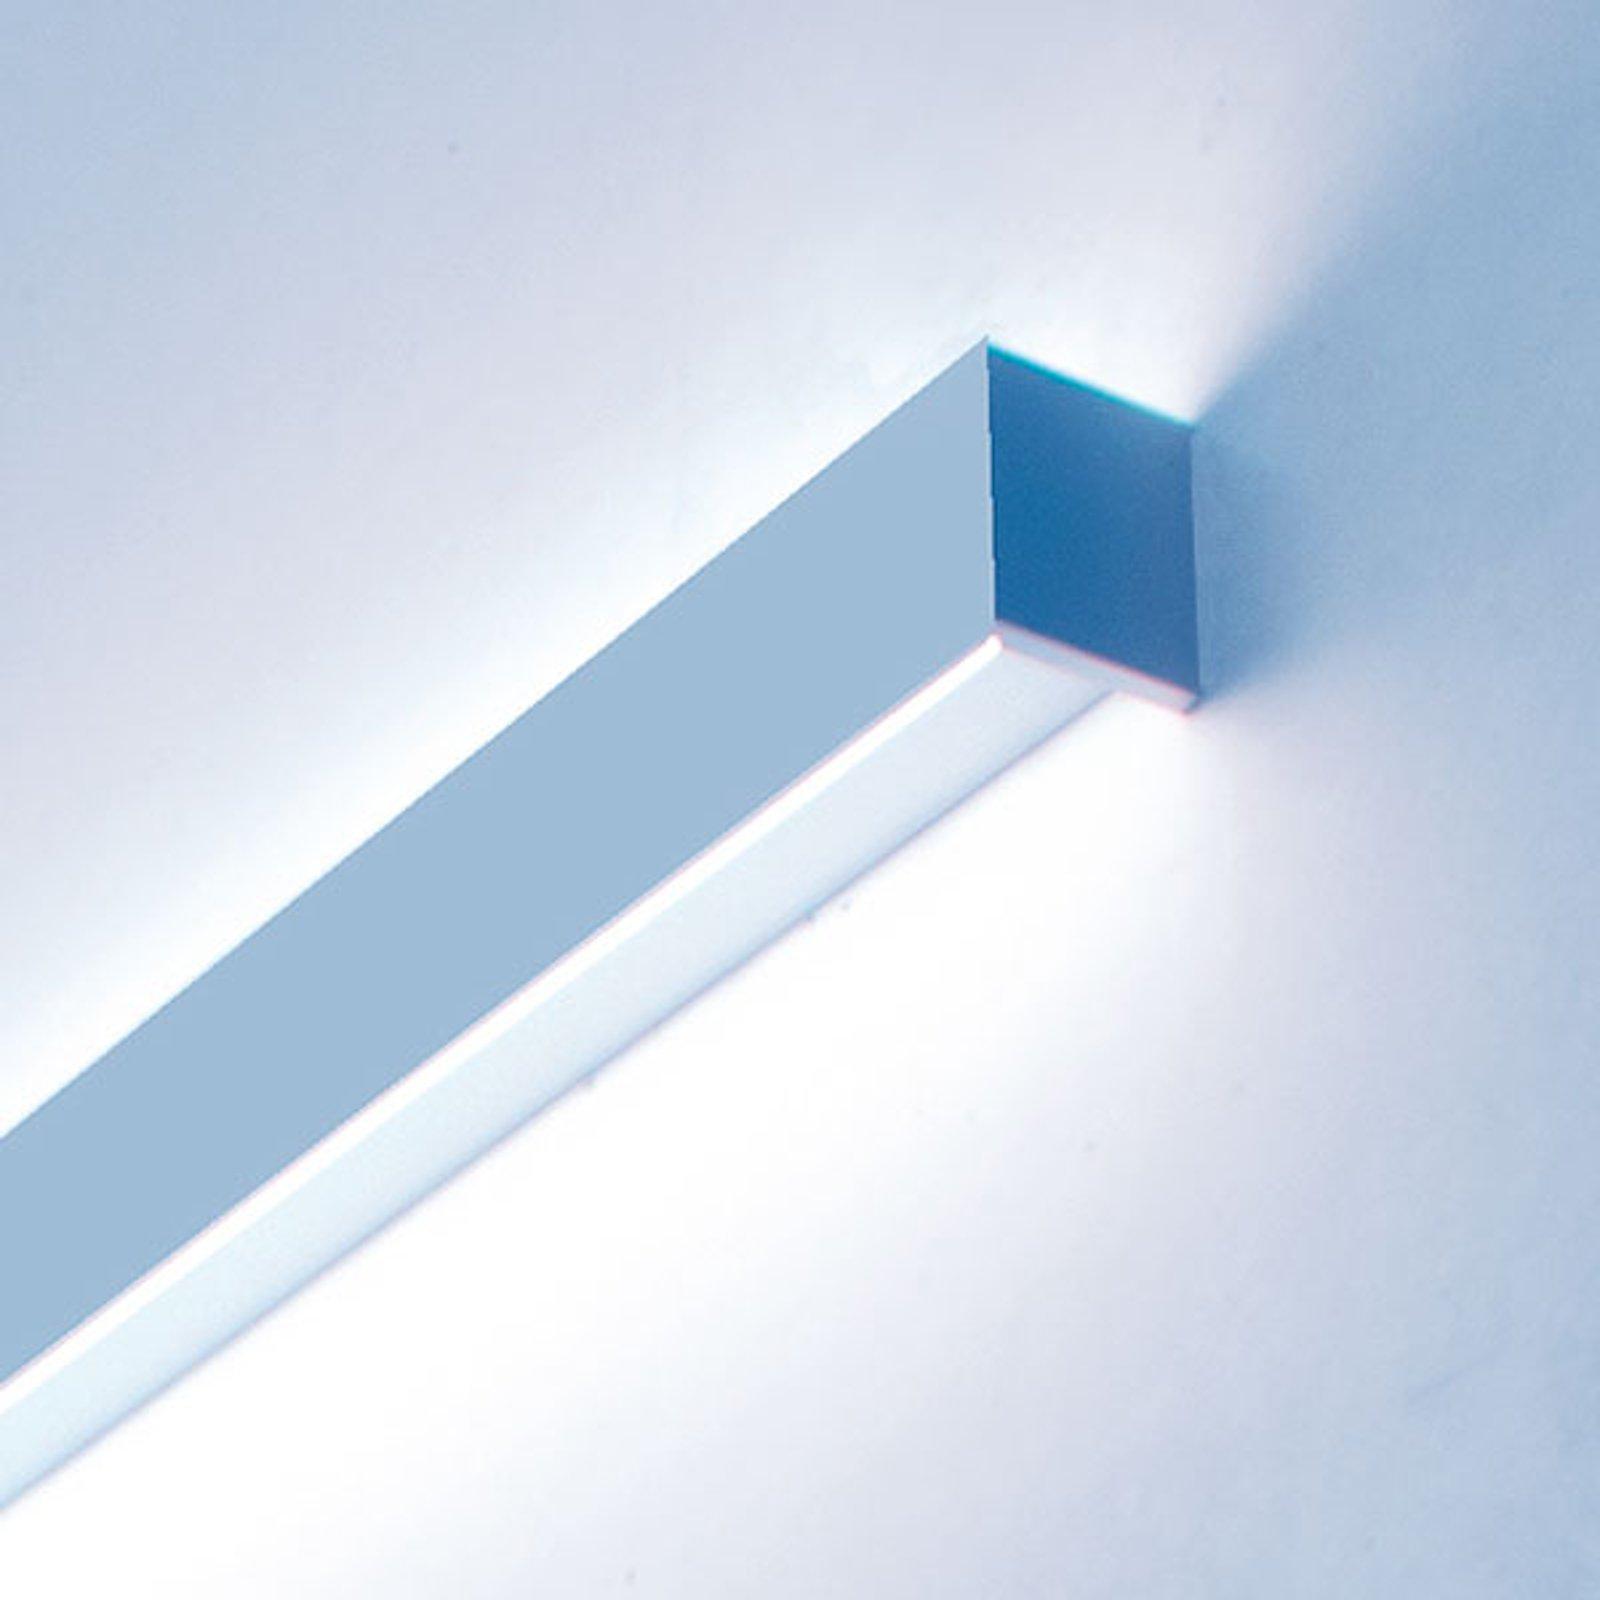 Matric W1 LED-vegglampe i 60 cm, 4 000 K